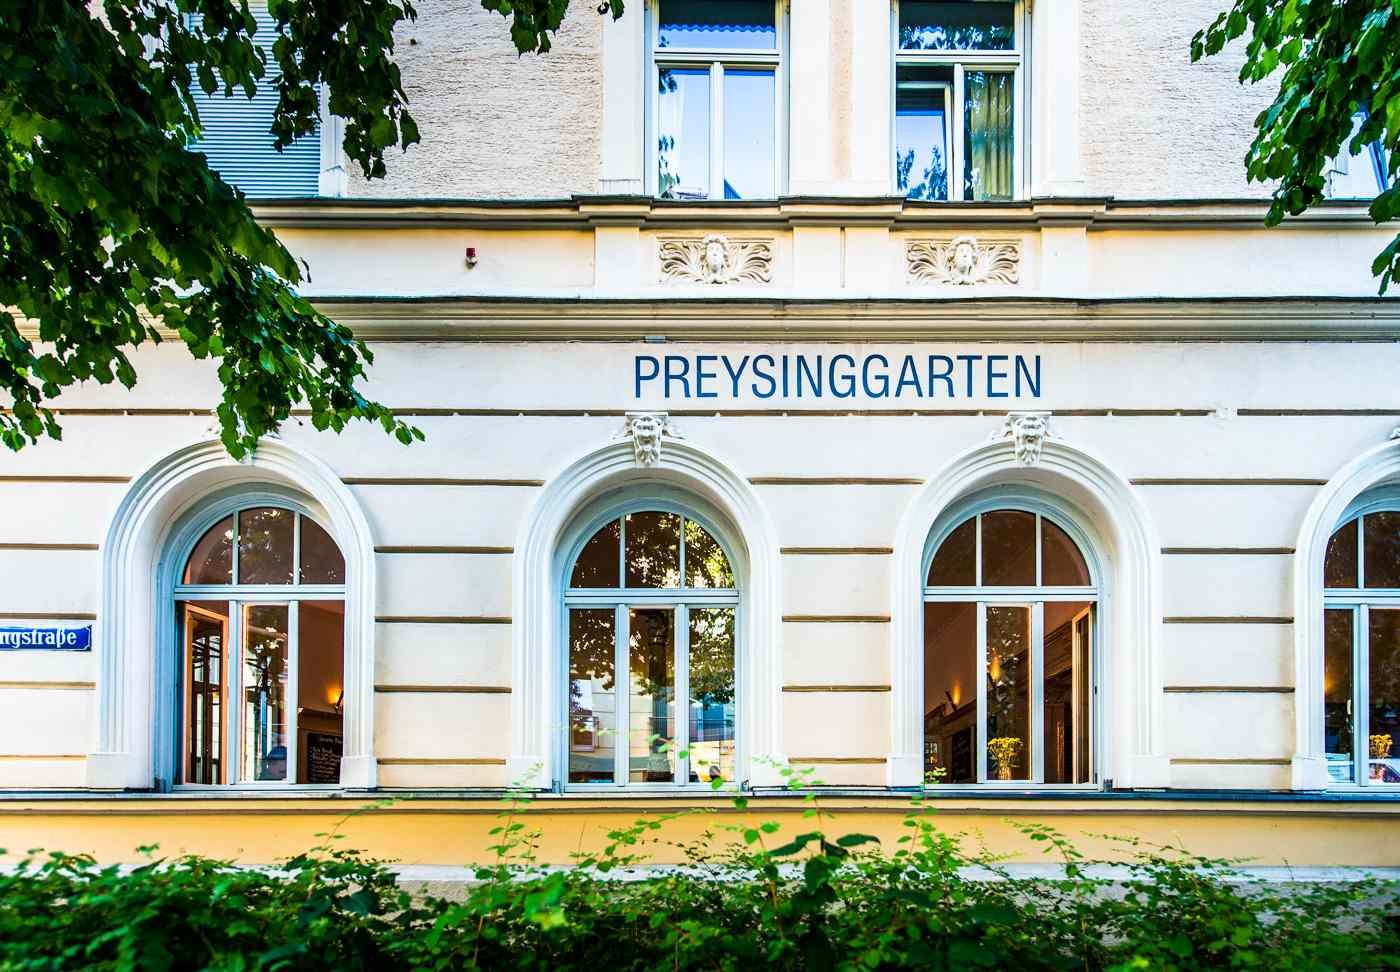 Preysinggarten in Munich